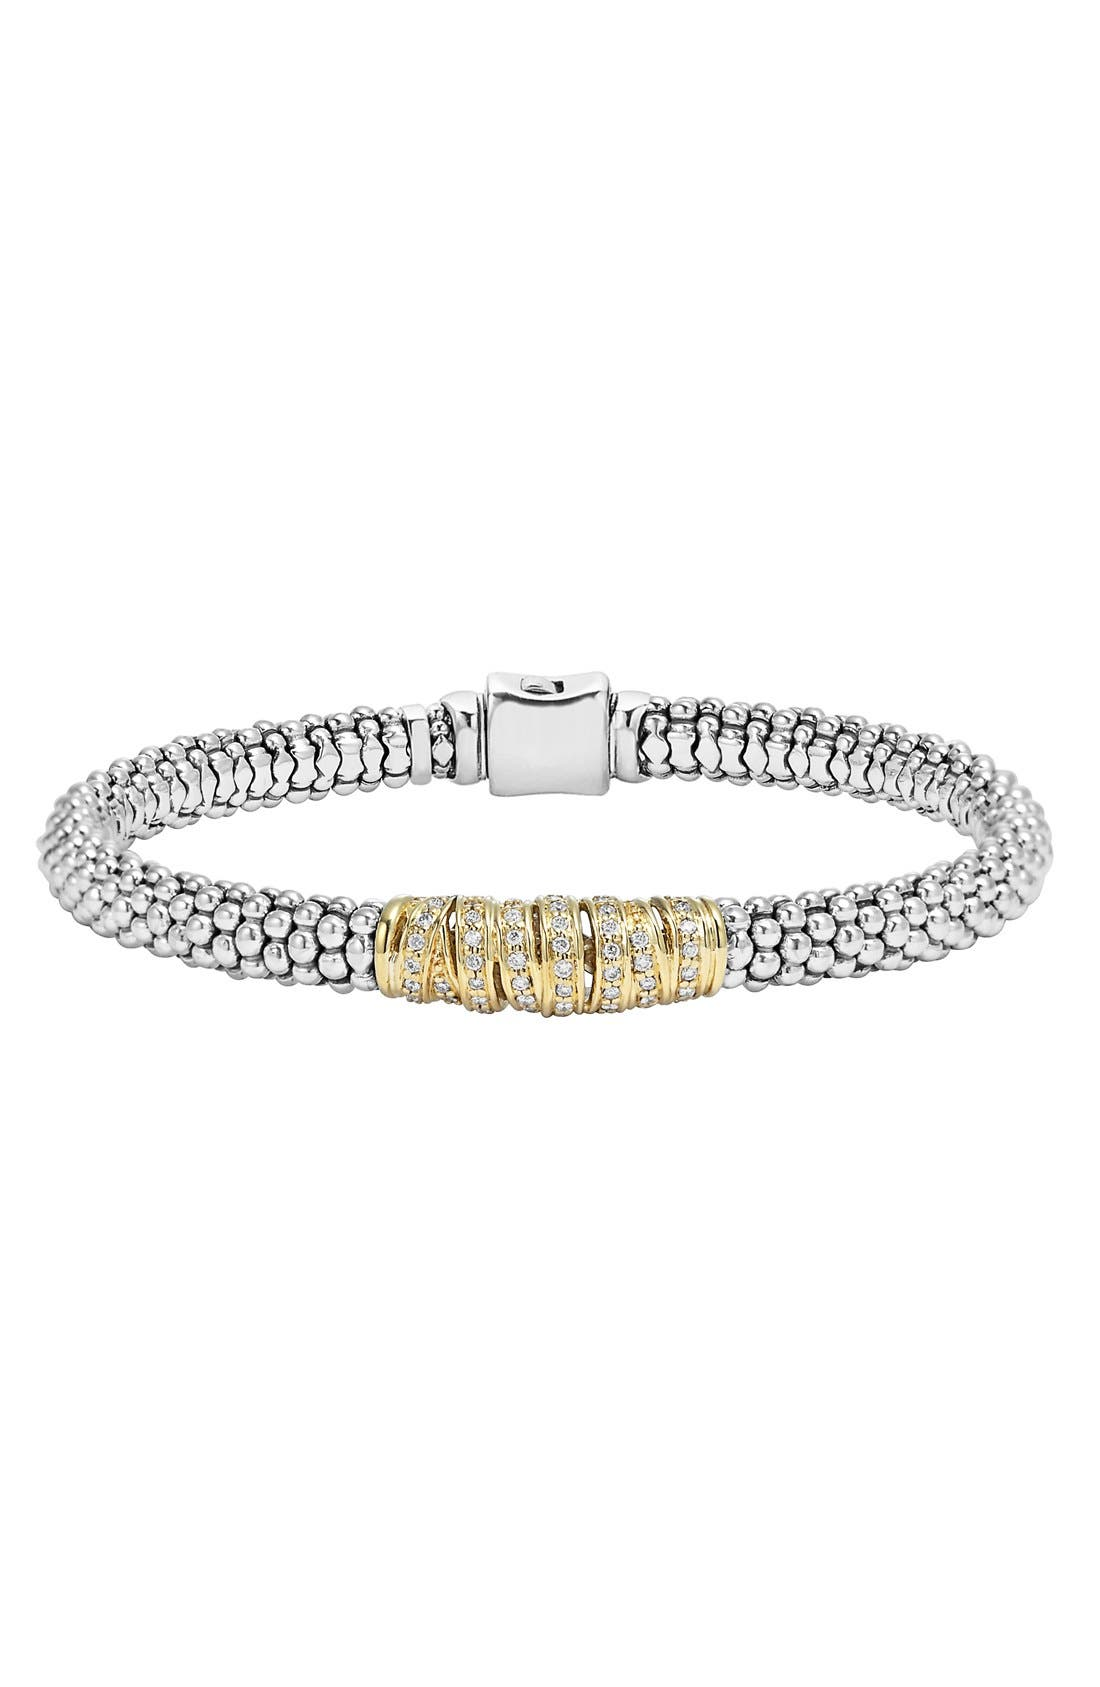 'Diamonds & Caviar' Diamond Bracelet,                             Main thumbnail 1, color,                             Sterling Silver/ Gold